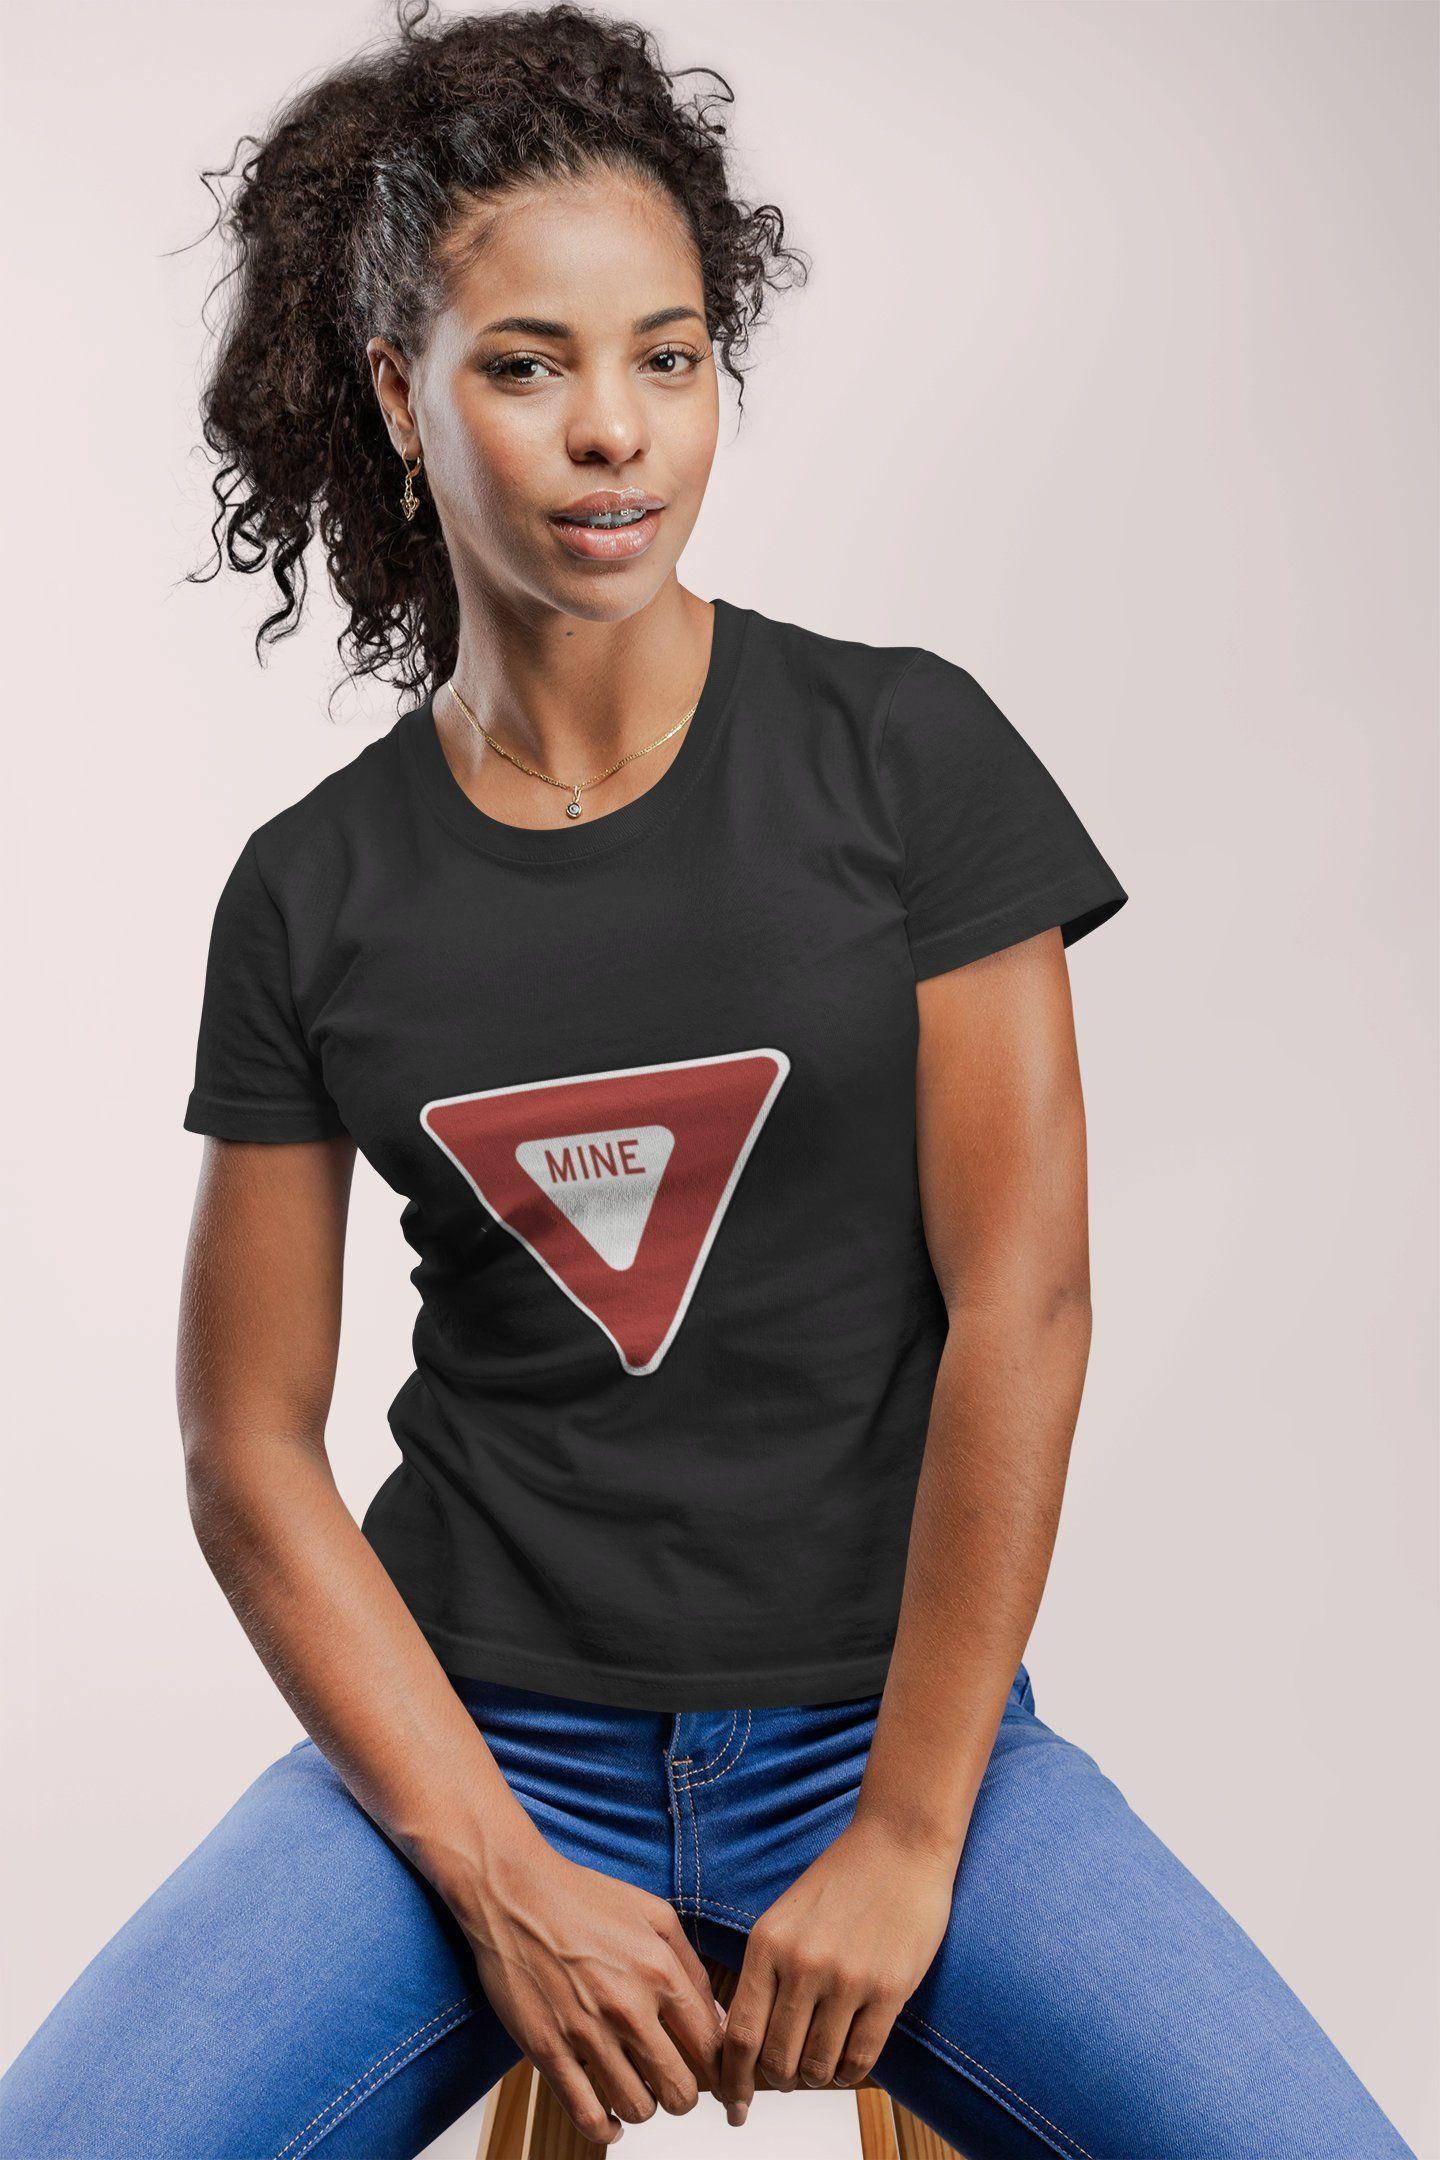 Pro Choice Mine Arrow Unisex Tee Defend Roe V Wade Feminist Etsy T Shirts For Women Dance Tee Black Lives Matter Shirt